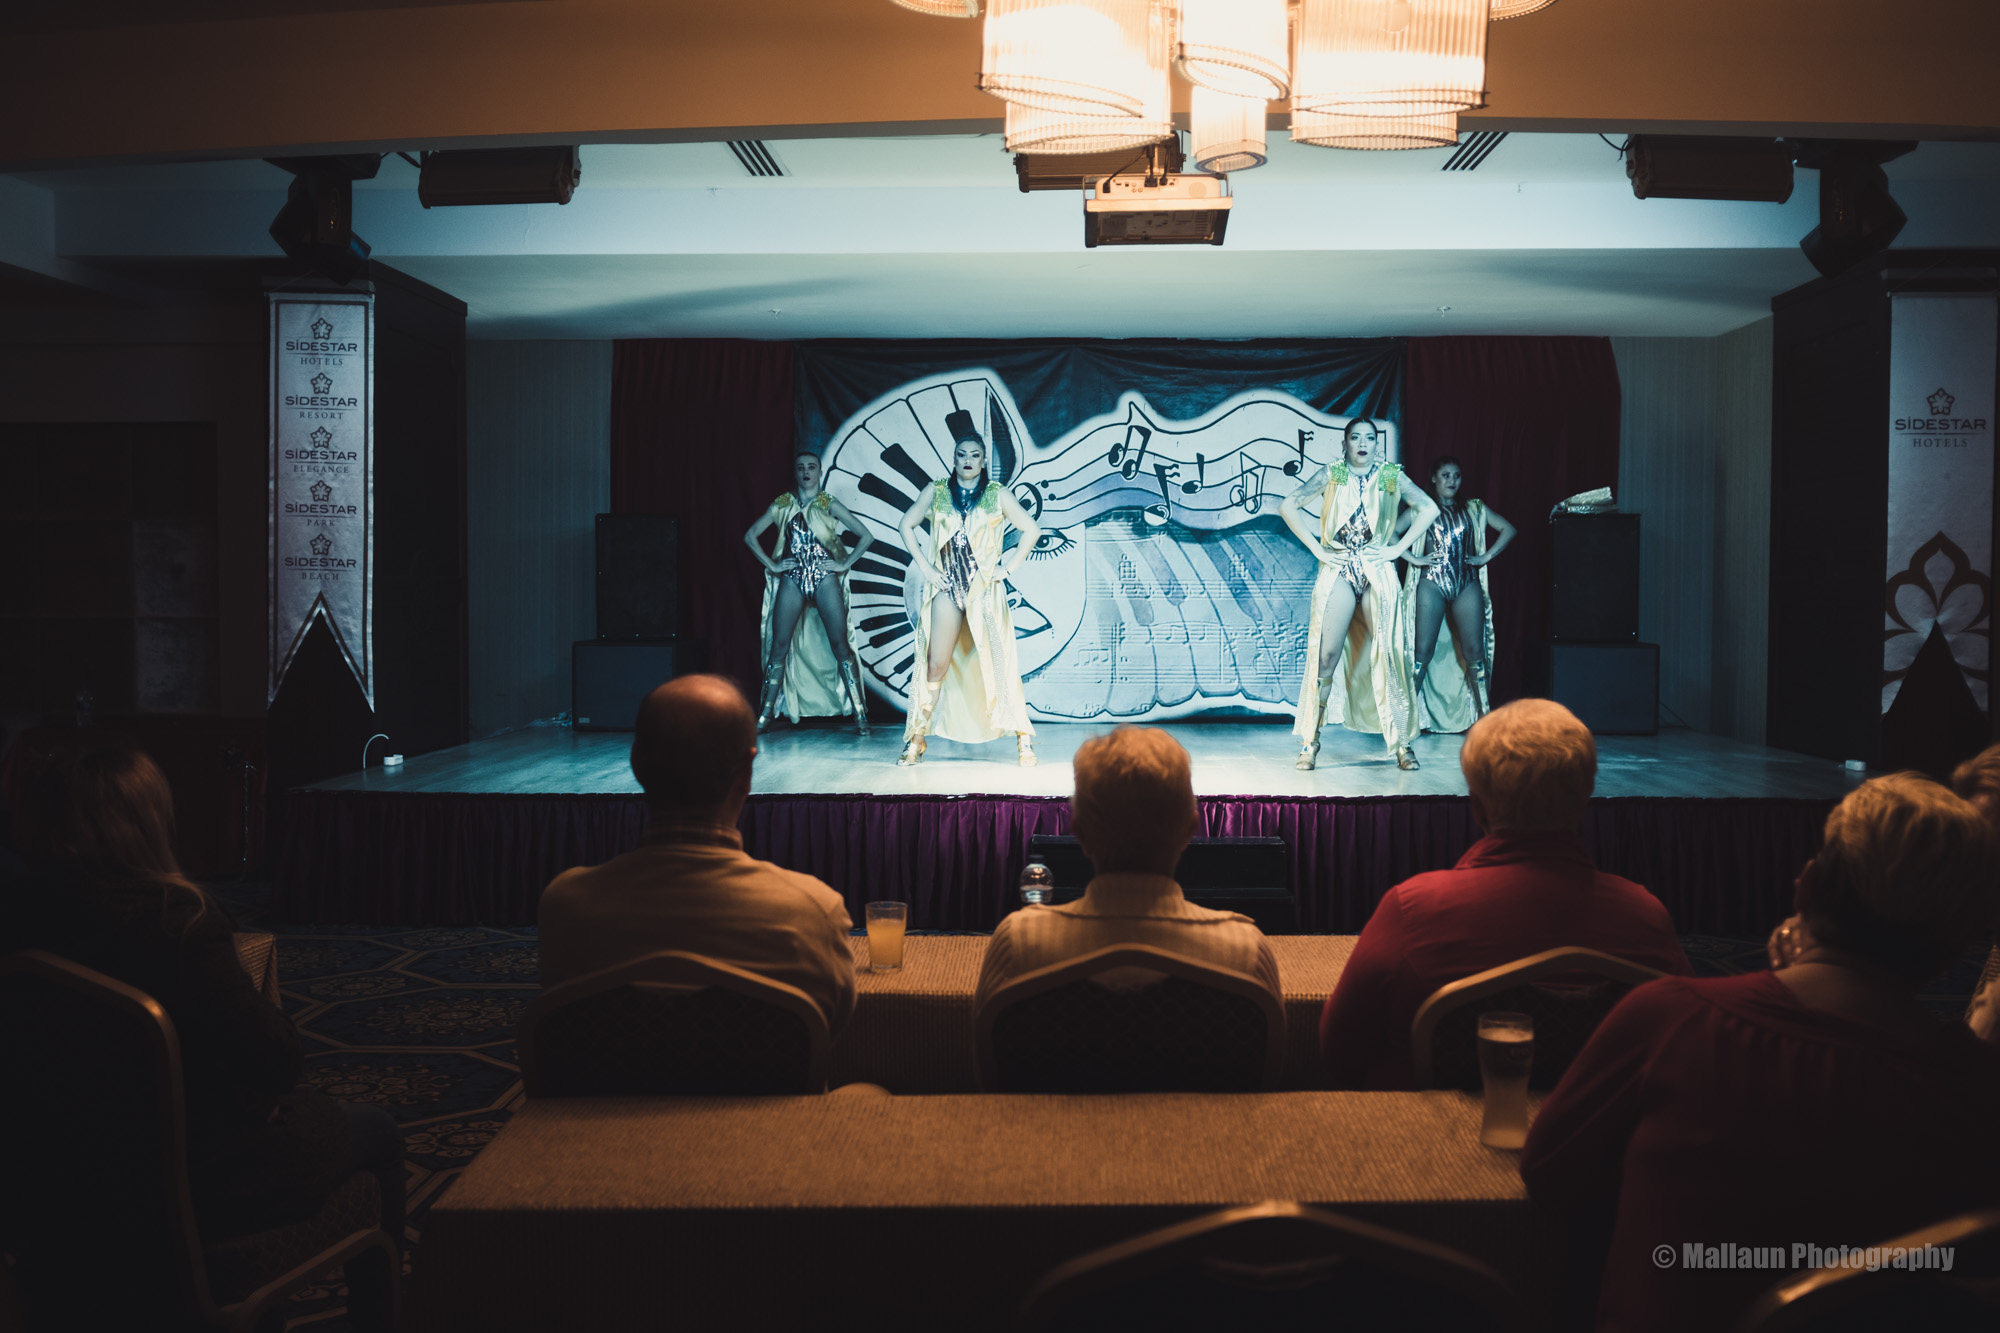 Die ultimative Hotel-Show im Rentnerparadies © Mallaun Photography